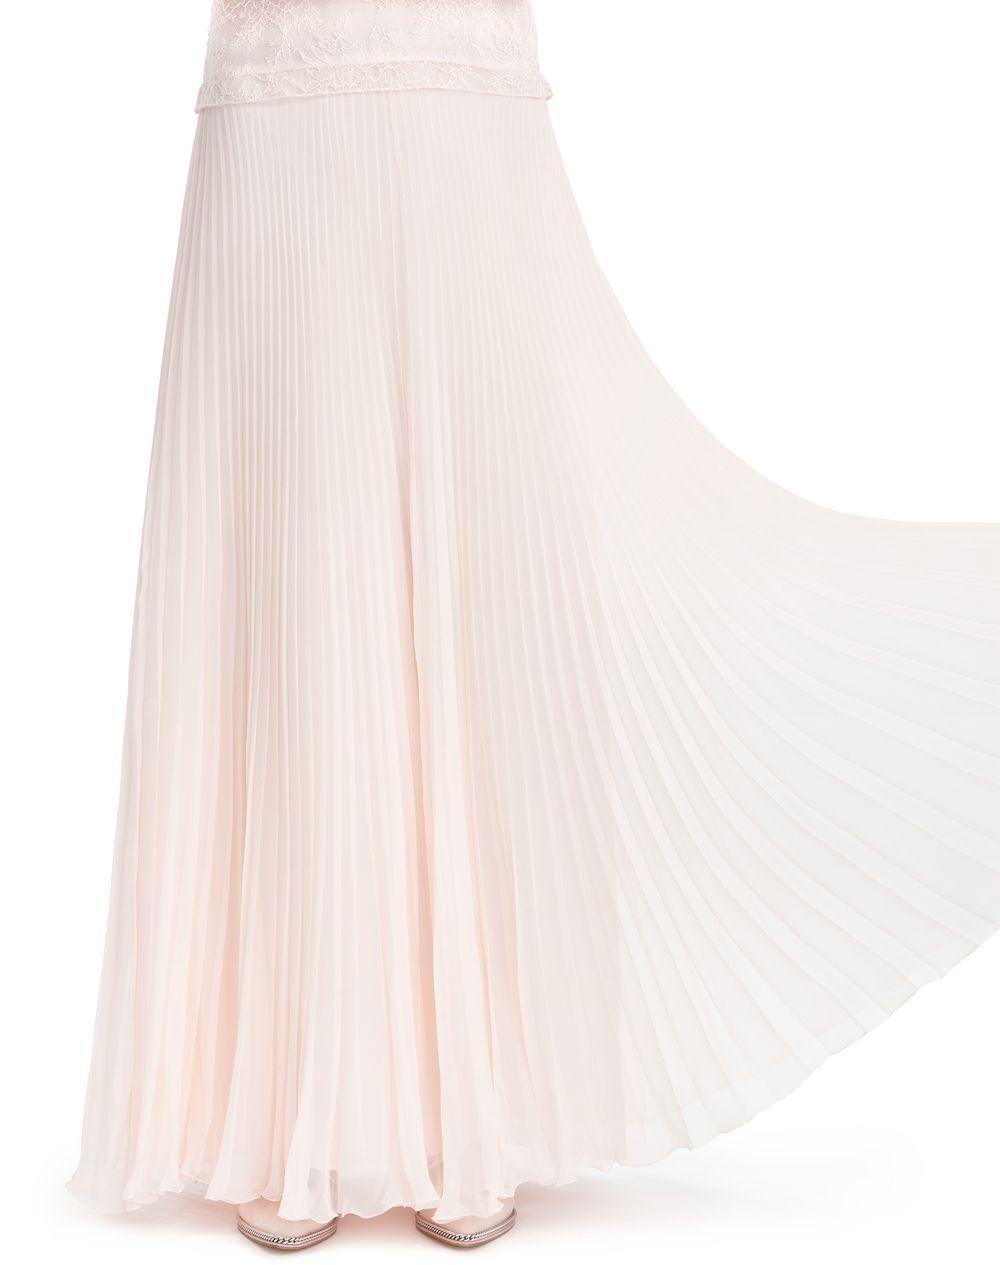 SILK CHIFFON DRESS - Lanvin